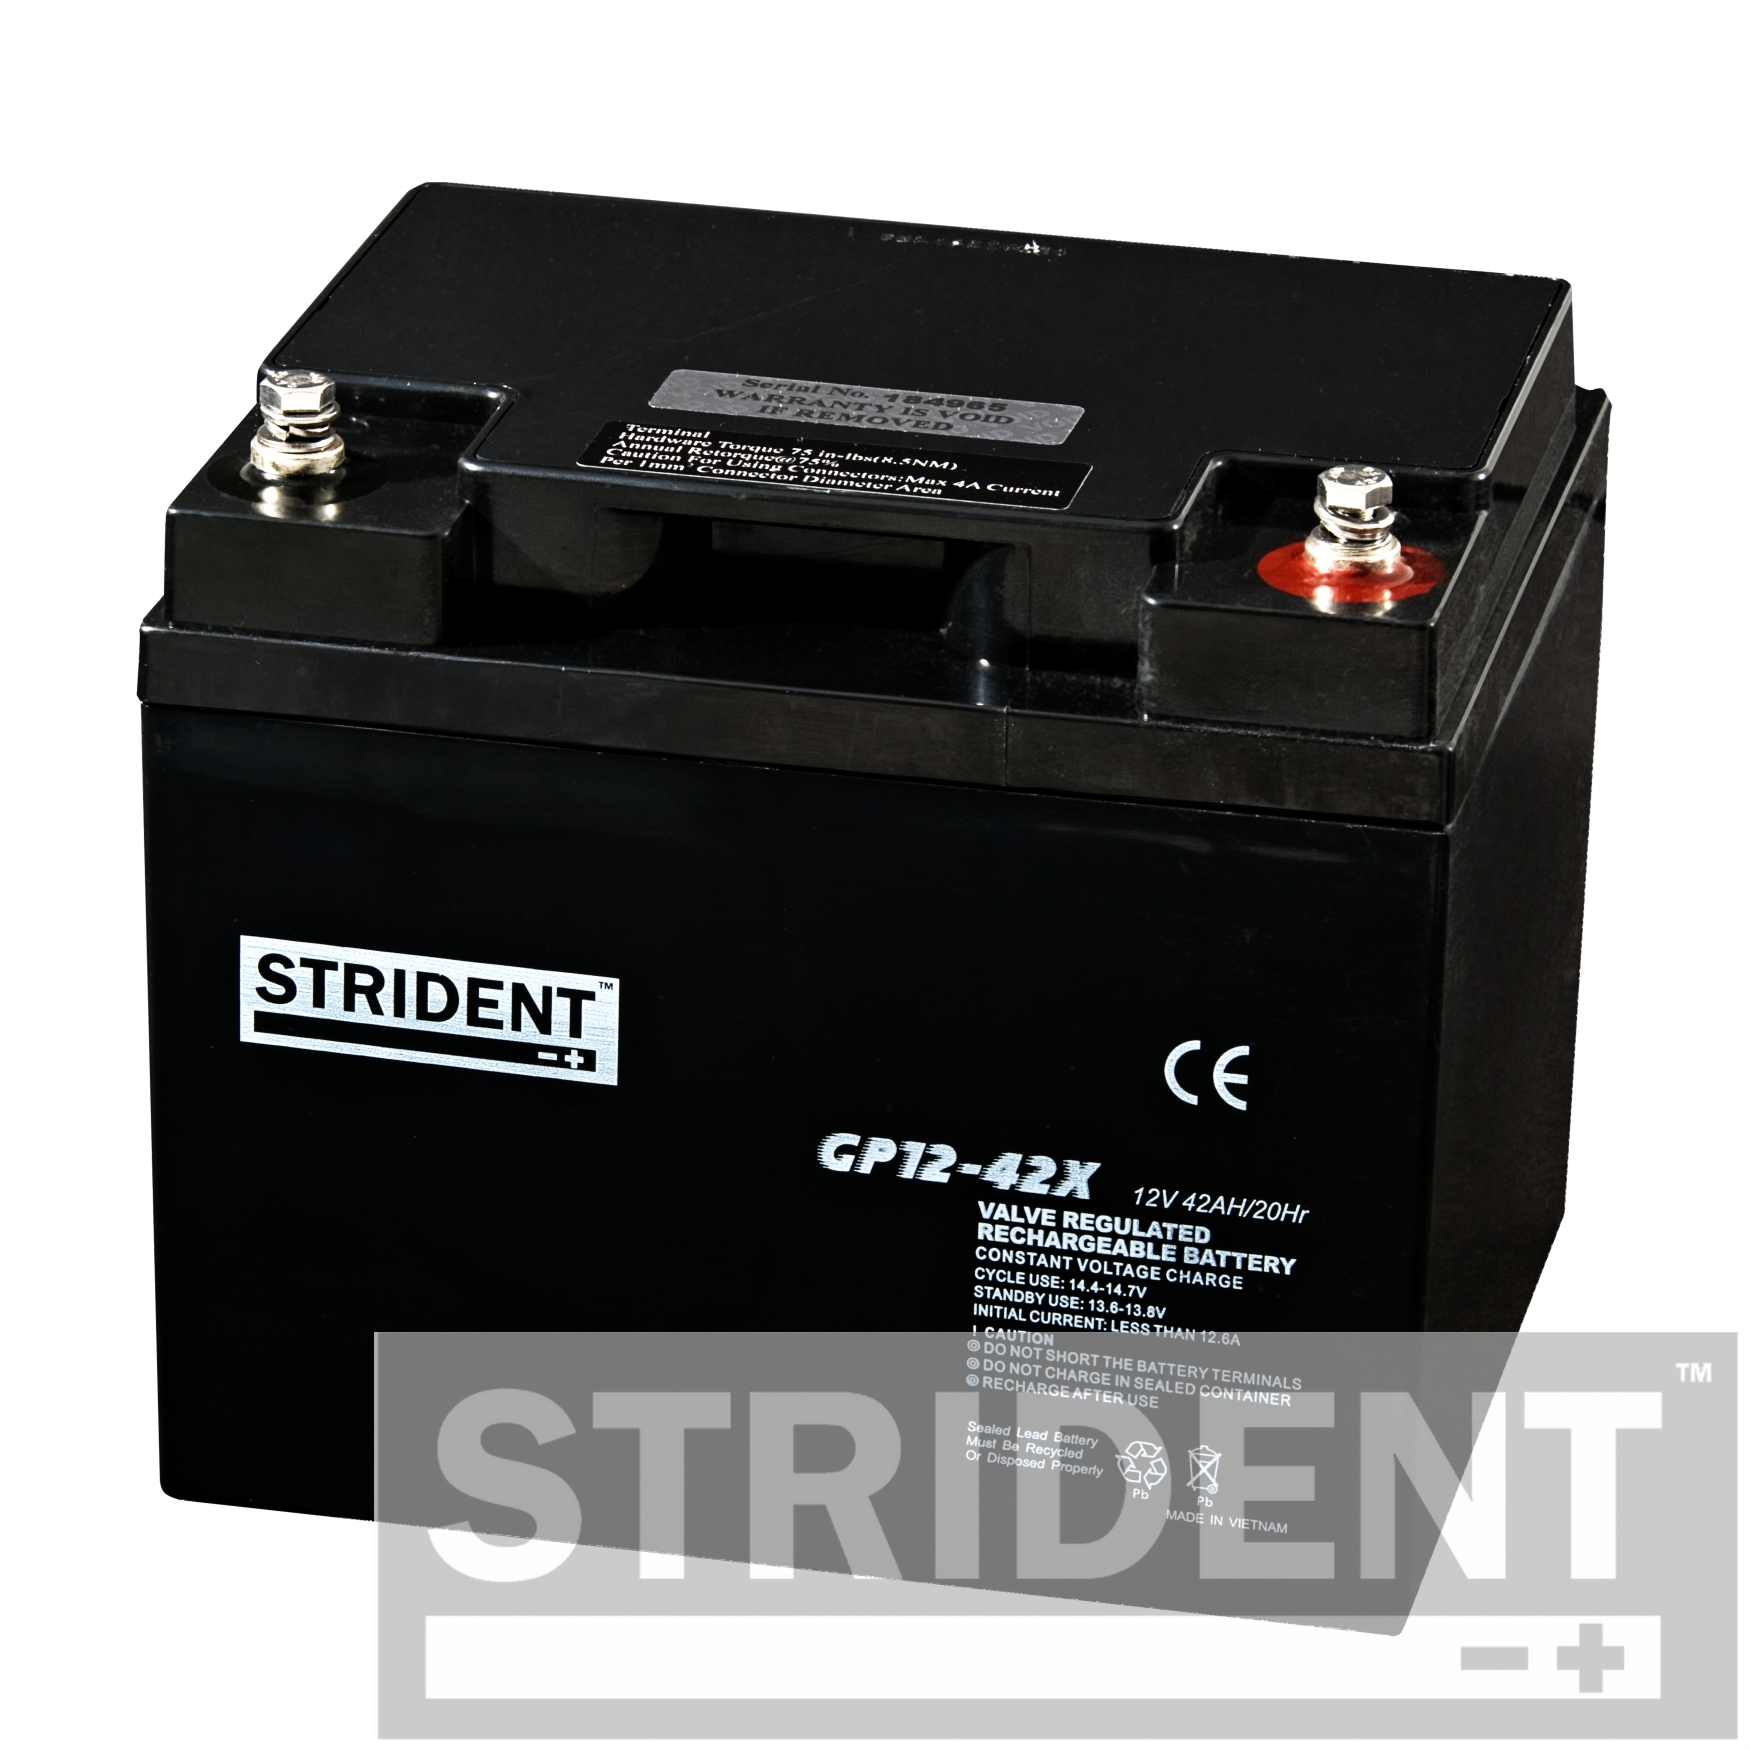 strident-agm-battery-gp12-42.jpg